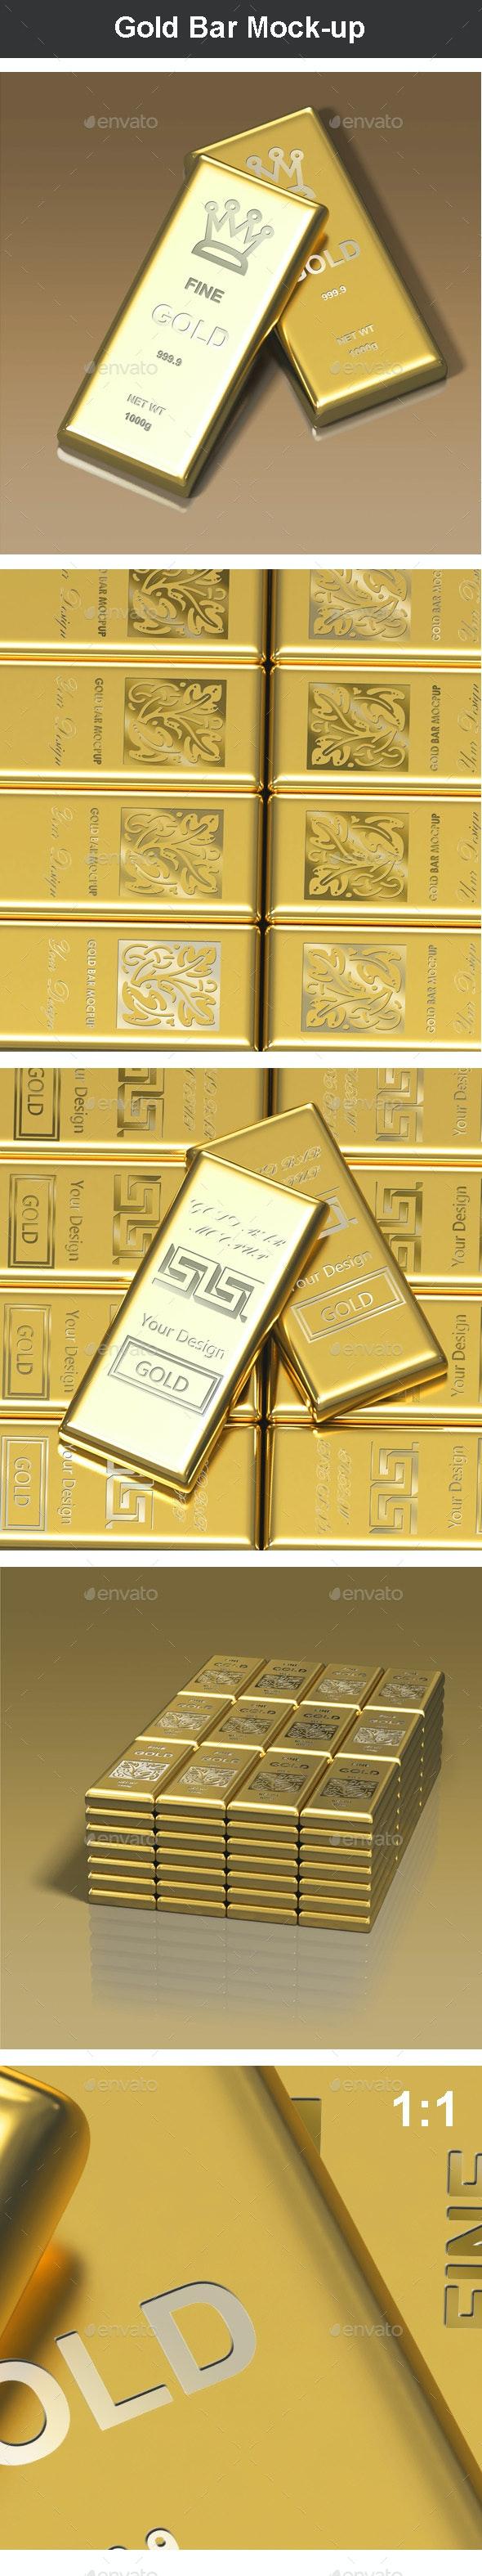 Gold Bar Mock-up - Miscellaneous Product Mock-Ups